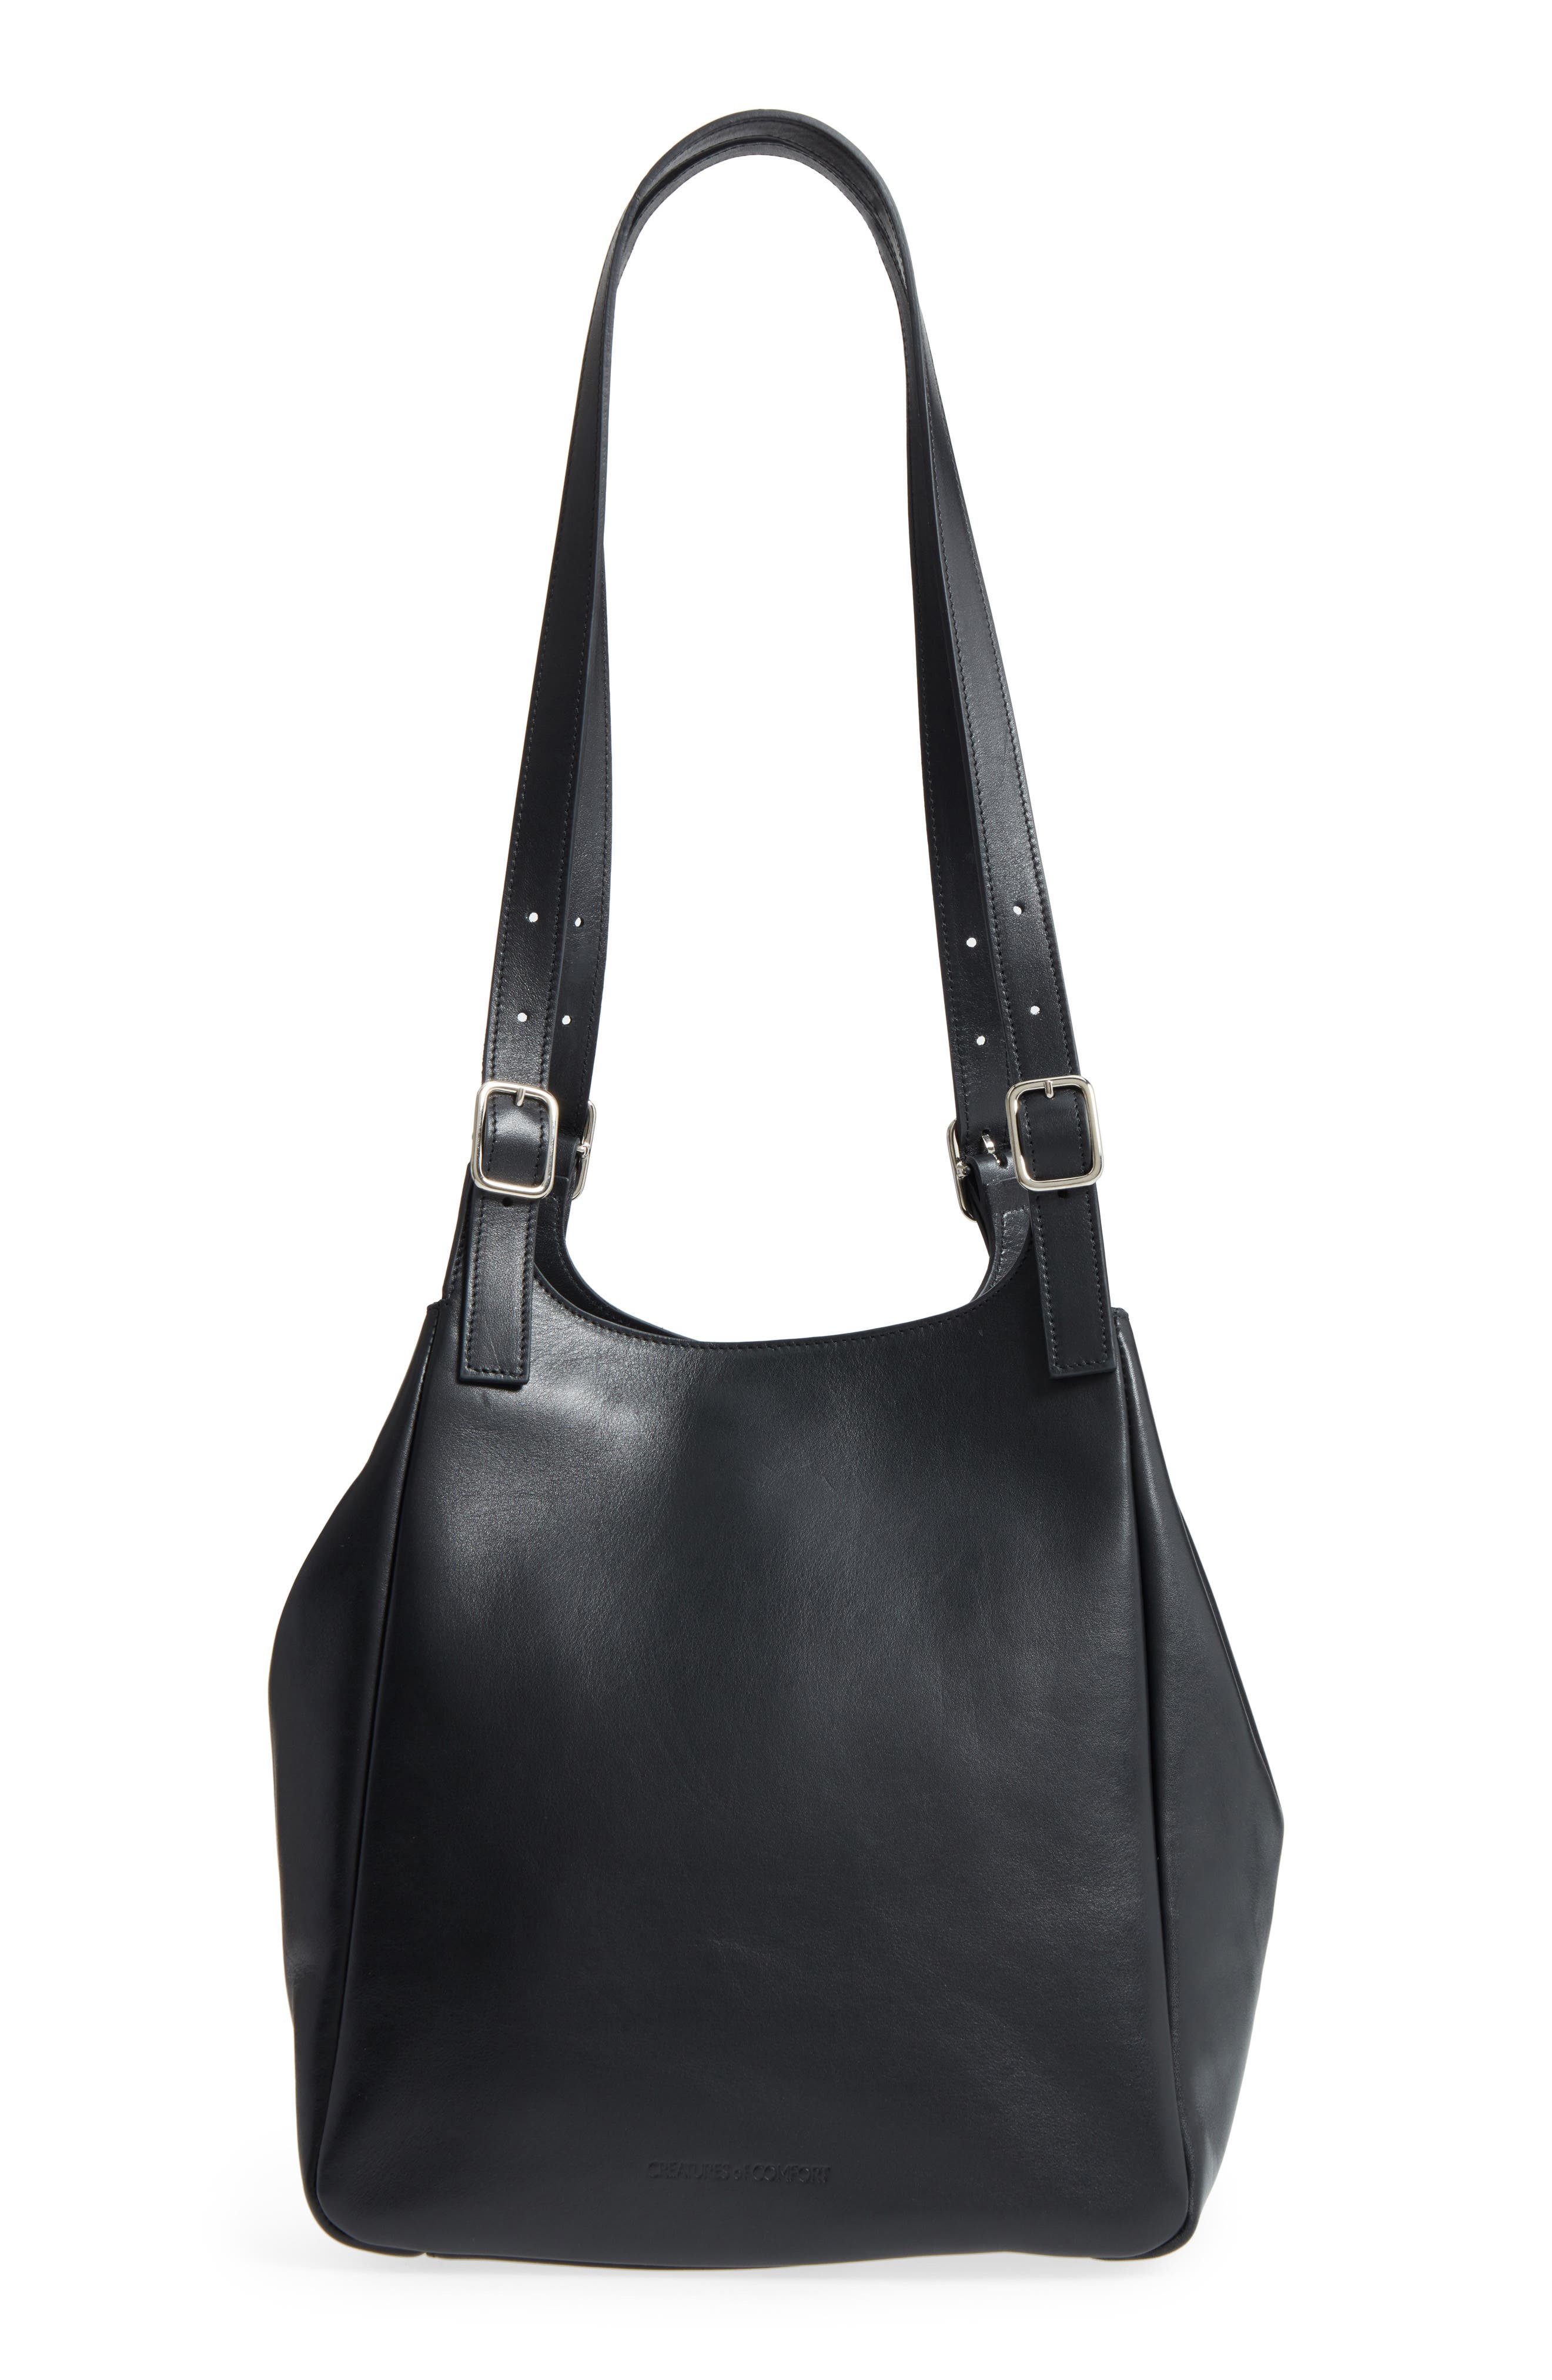 Alternate Image 1 Selected - Creatures of Comfort Pint Bag